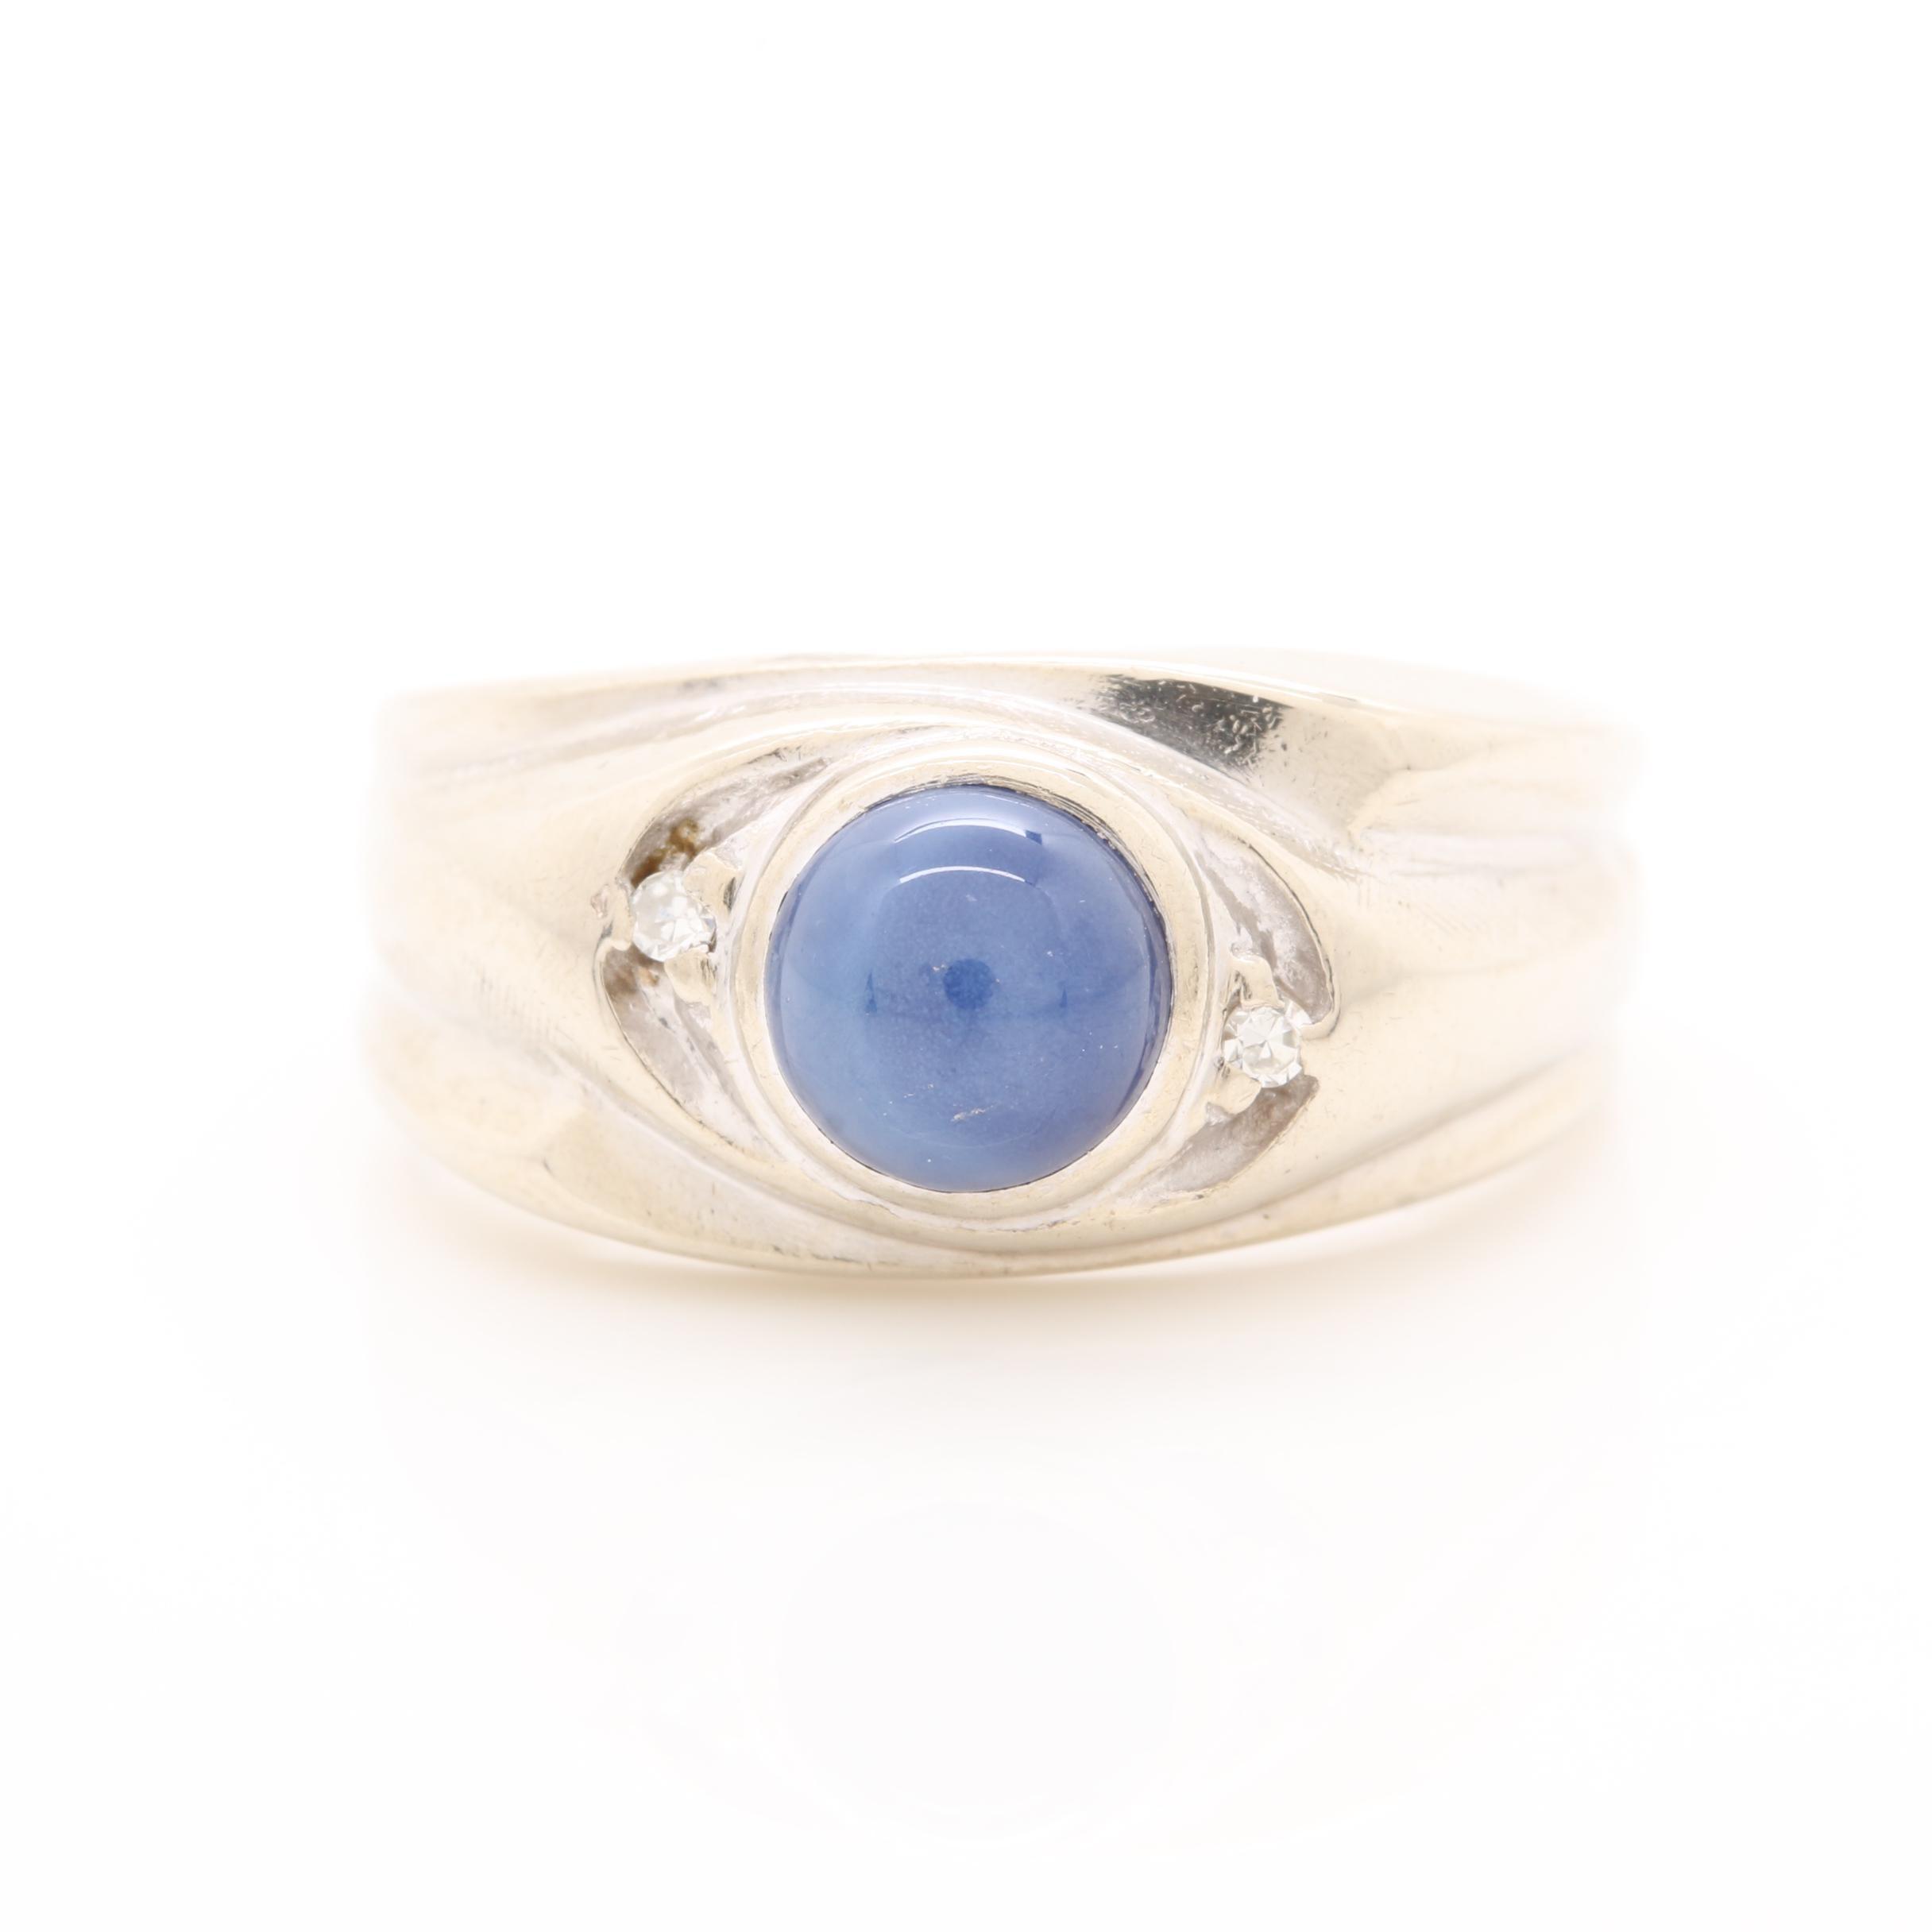 14K White Gold Synthetic Star Sapphire Diamond Ring